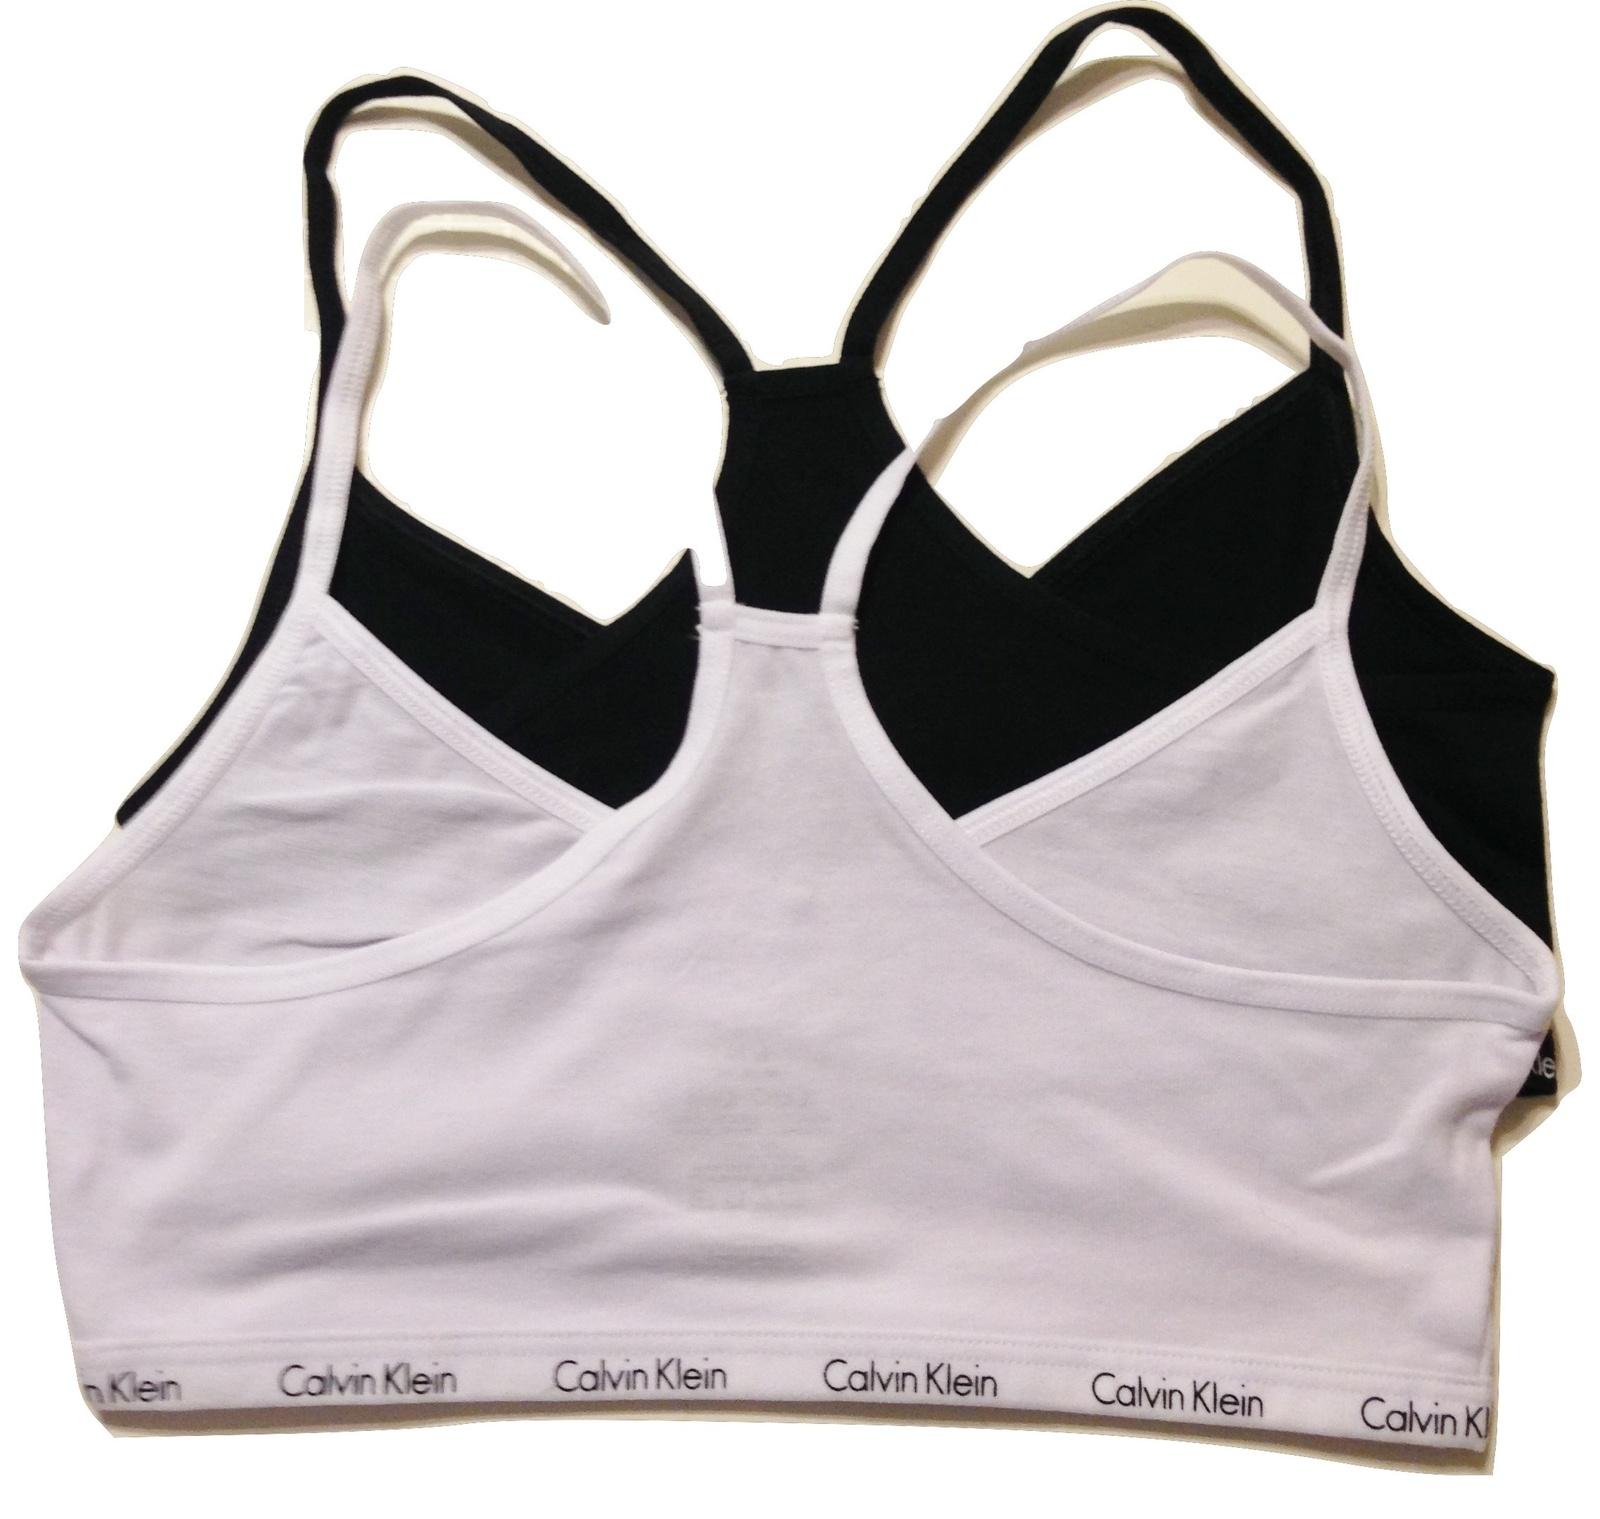 dd179429e5baf Calvin Klein Girls Crop Bras White Black S and 37 similar items